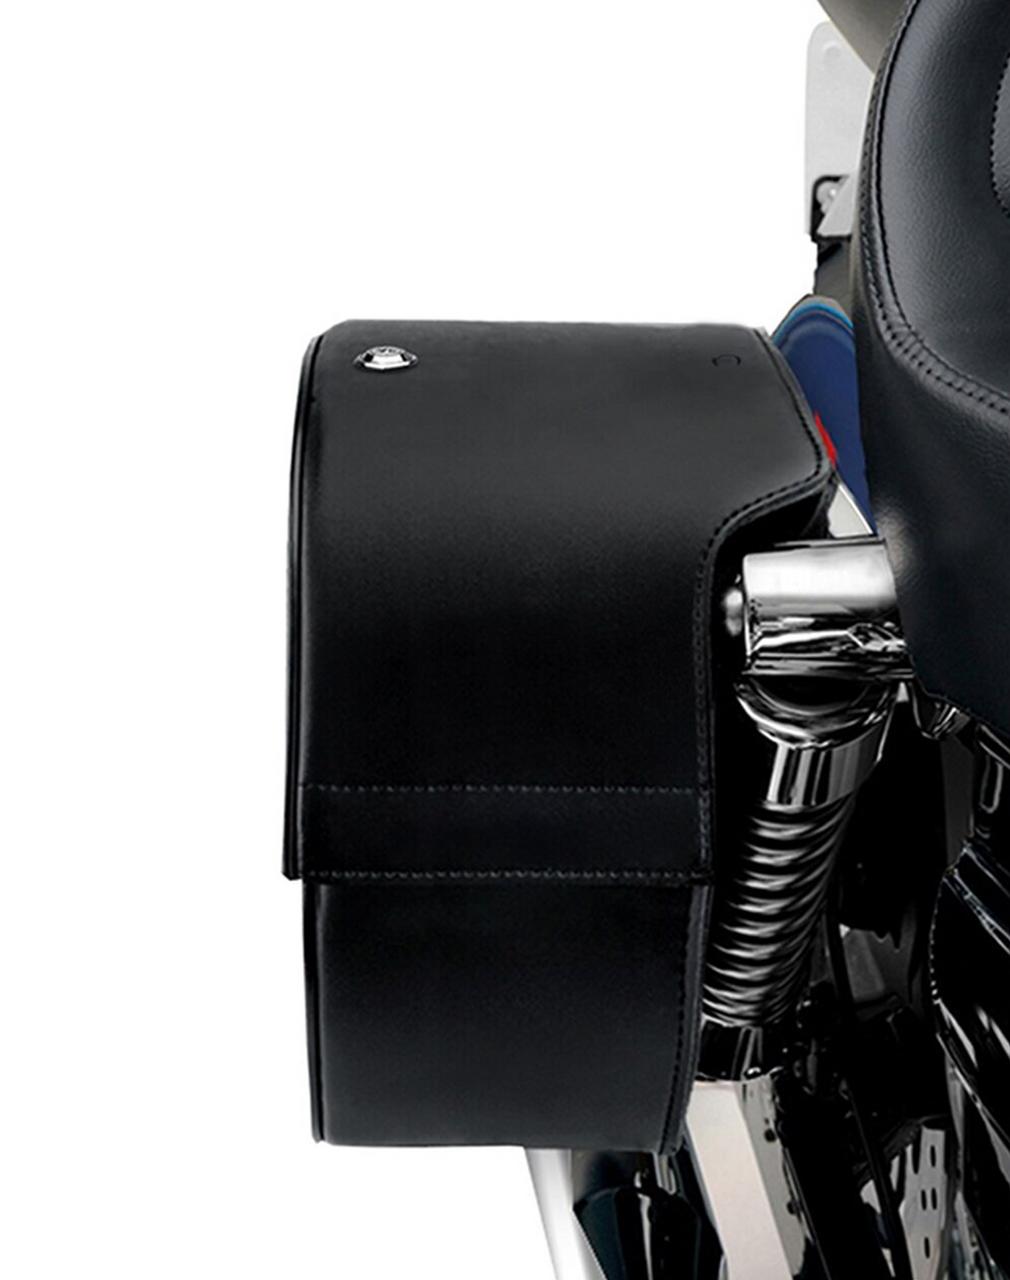 Kawasaki Eliminator 125 Shock Cutout Warrior Slanted Large Motorcycle Saddlebags Shock Cutout View